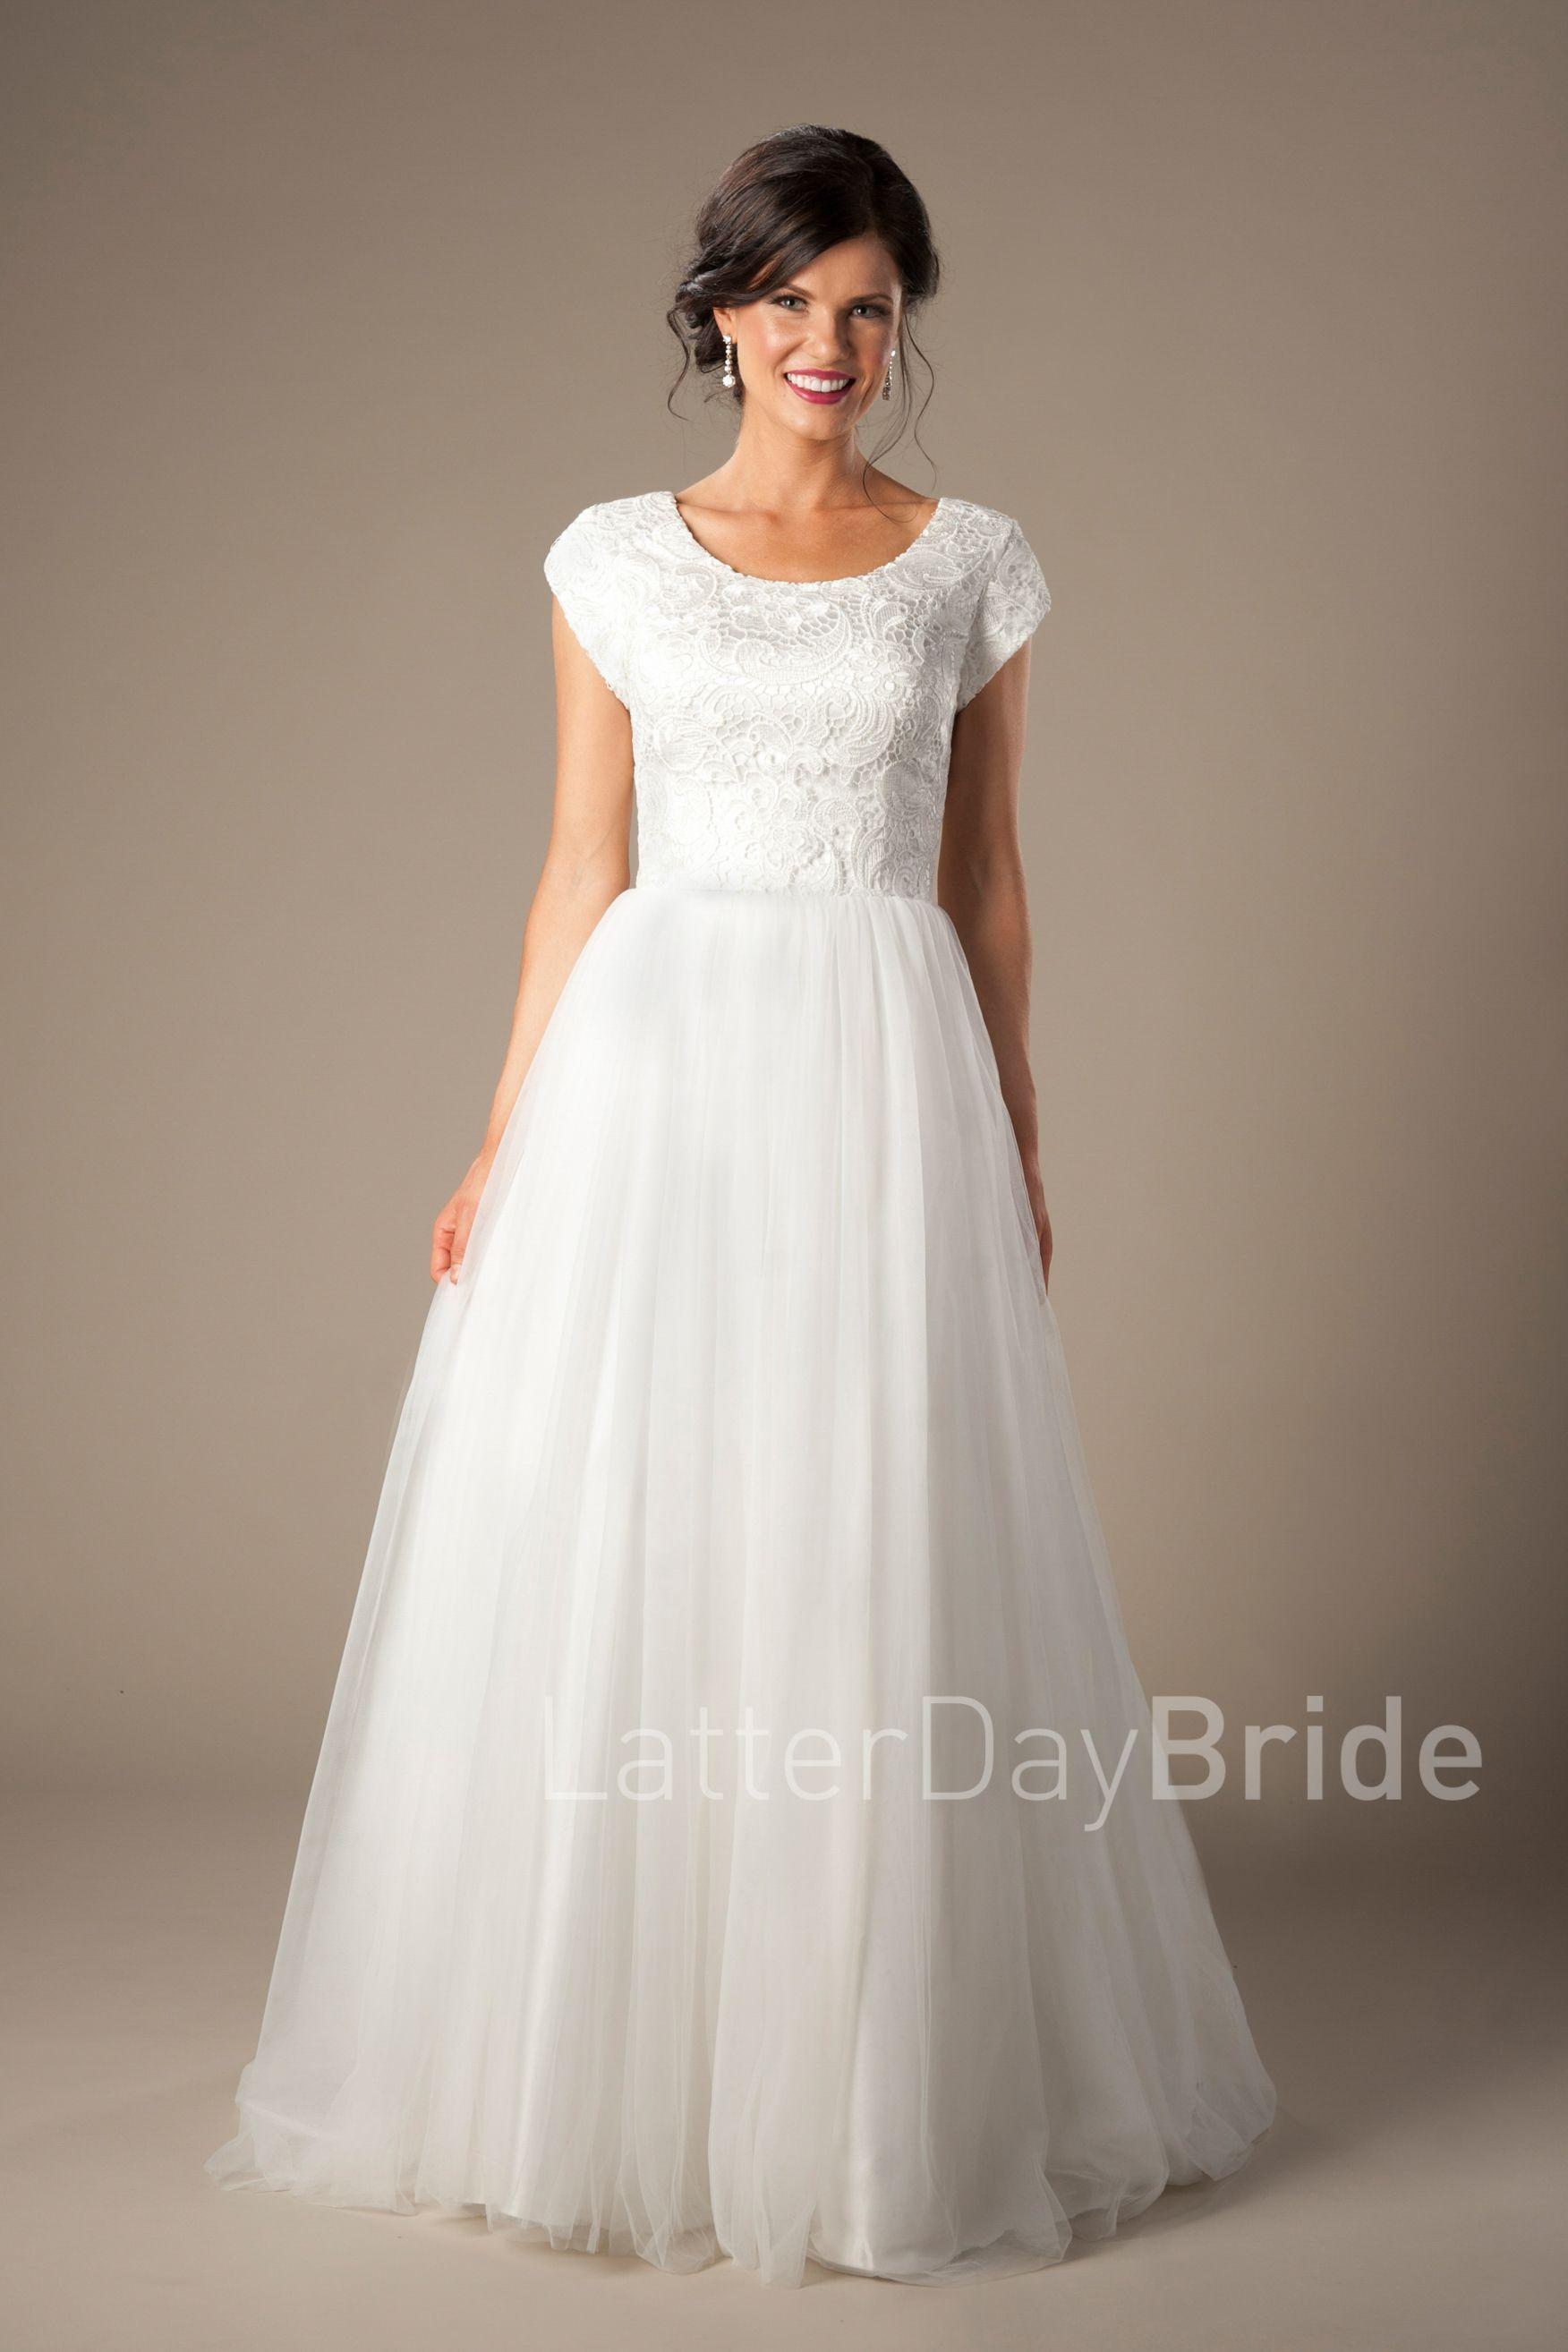 Pin On Modest Wedding Dresses [ 2628 x 1752 Pixel ]